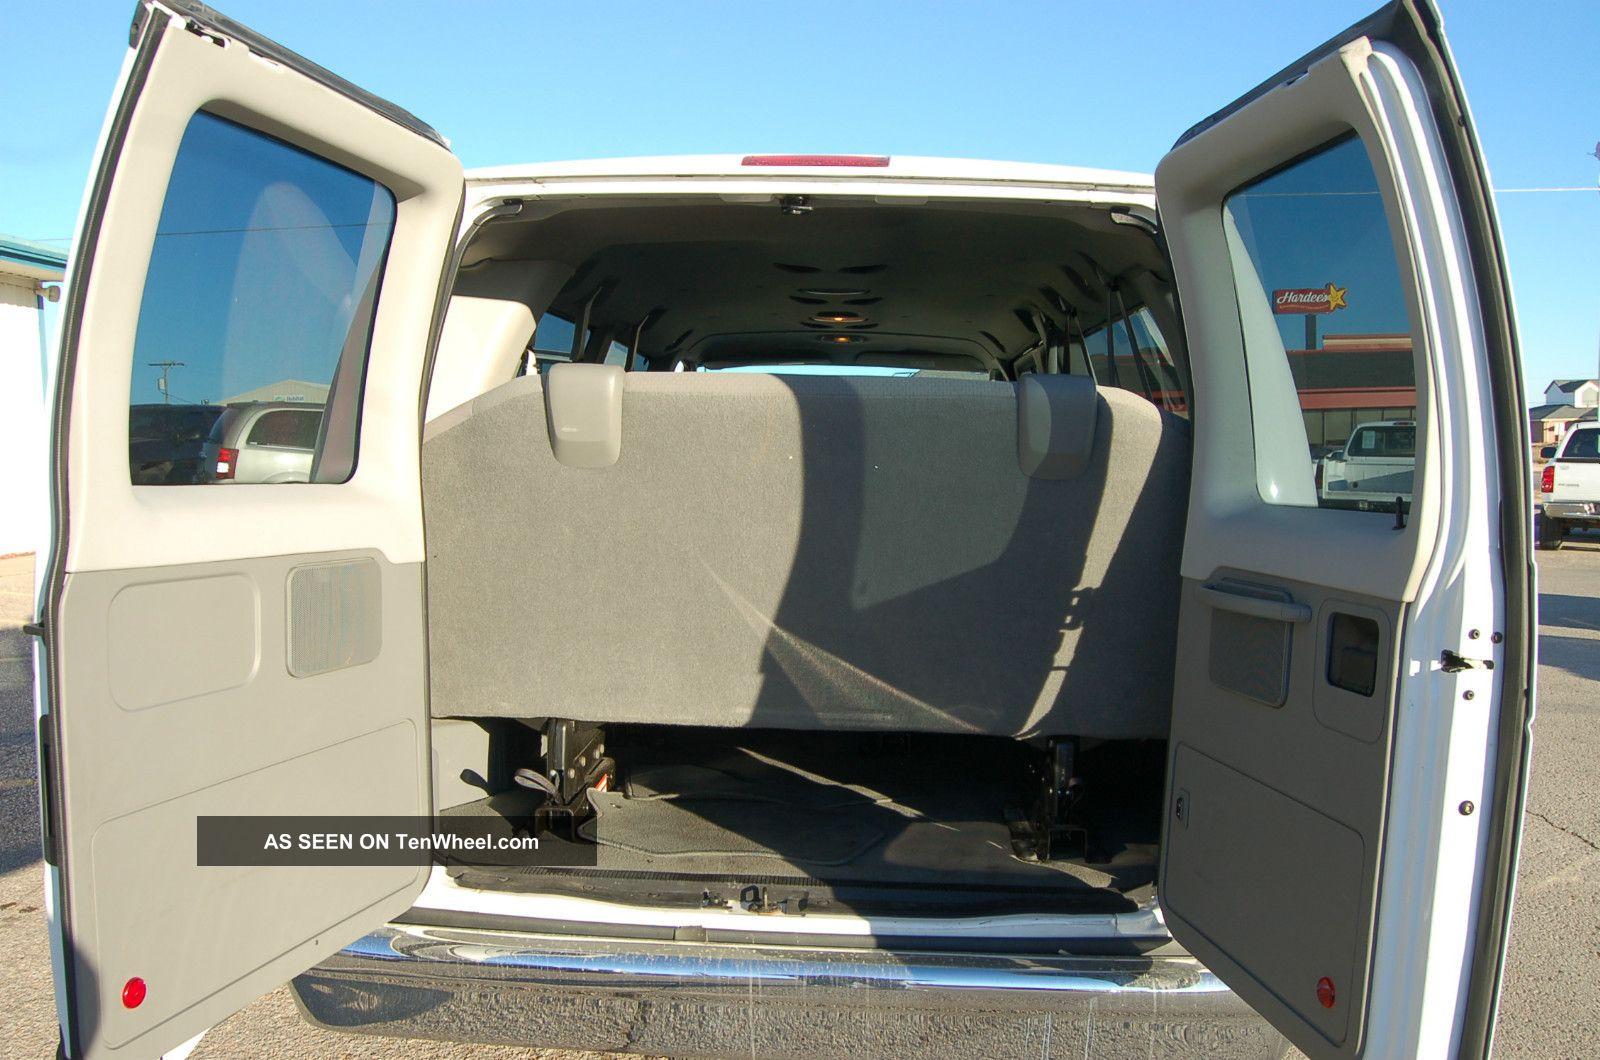 2010 ford e350 xlt sd ext wagon xlt 15 passenger van. Black Bedroom Furniture Sets. Home Design Ideas